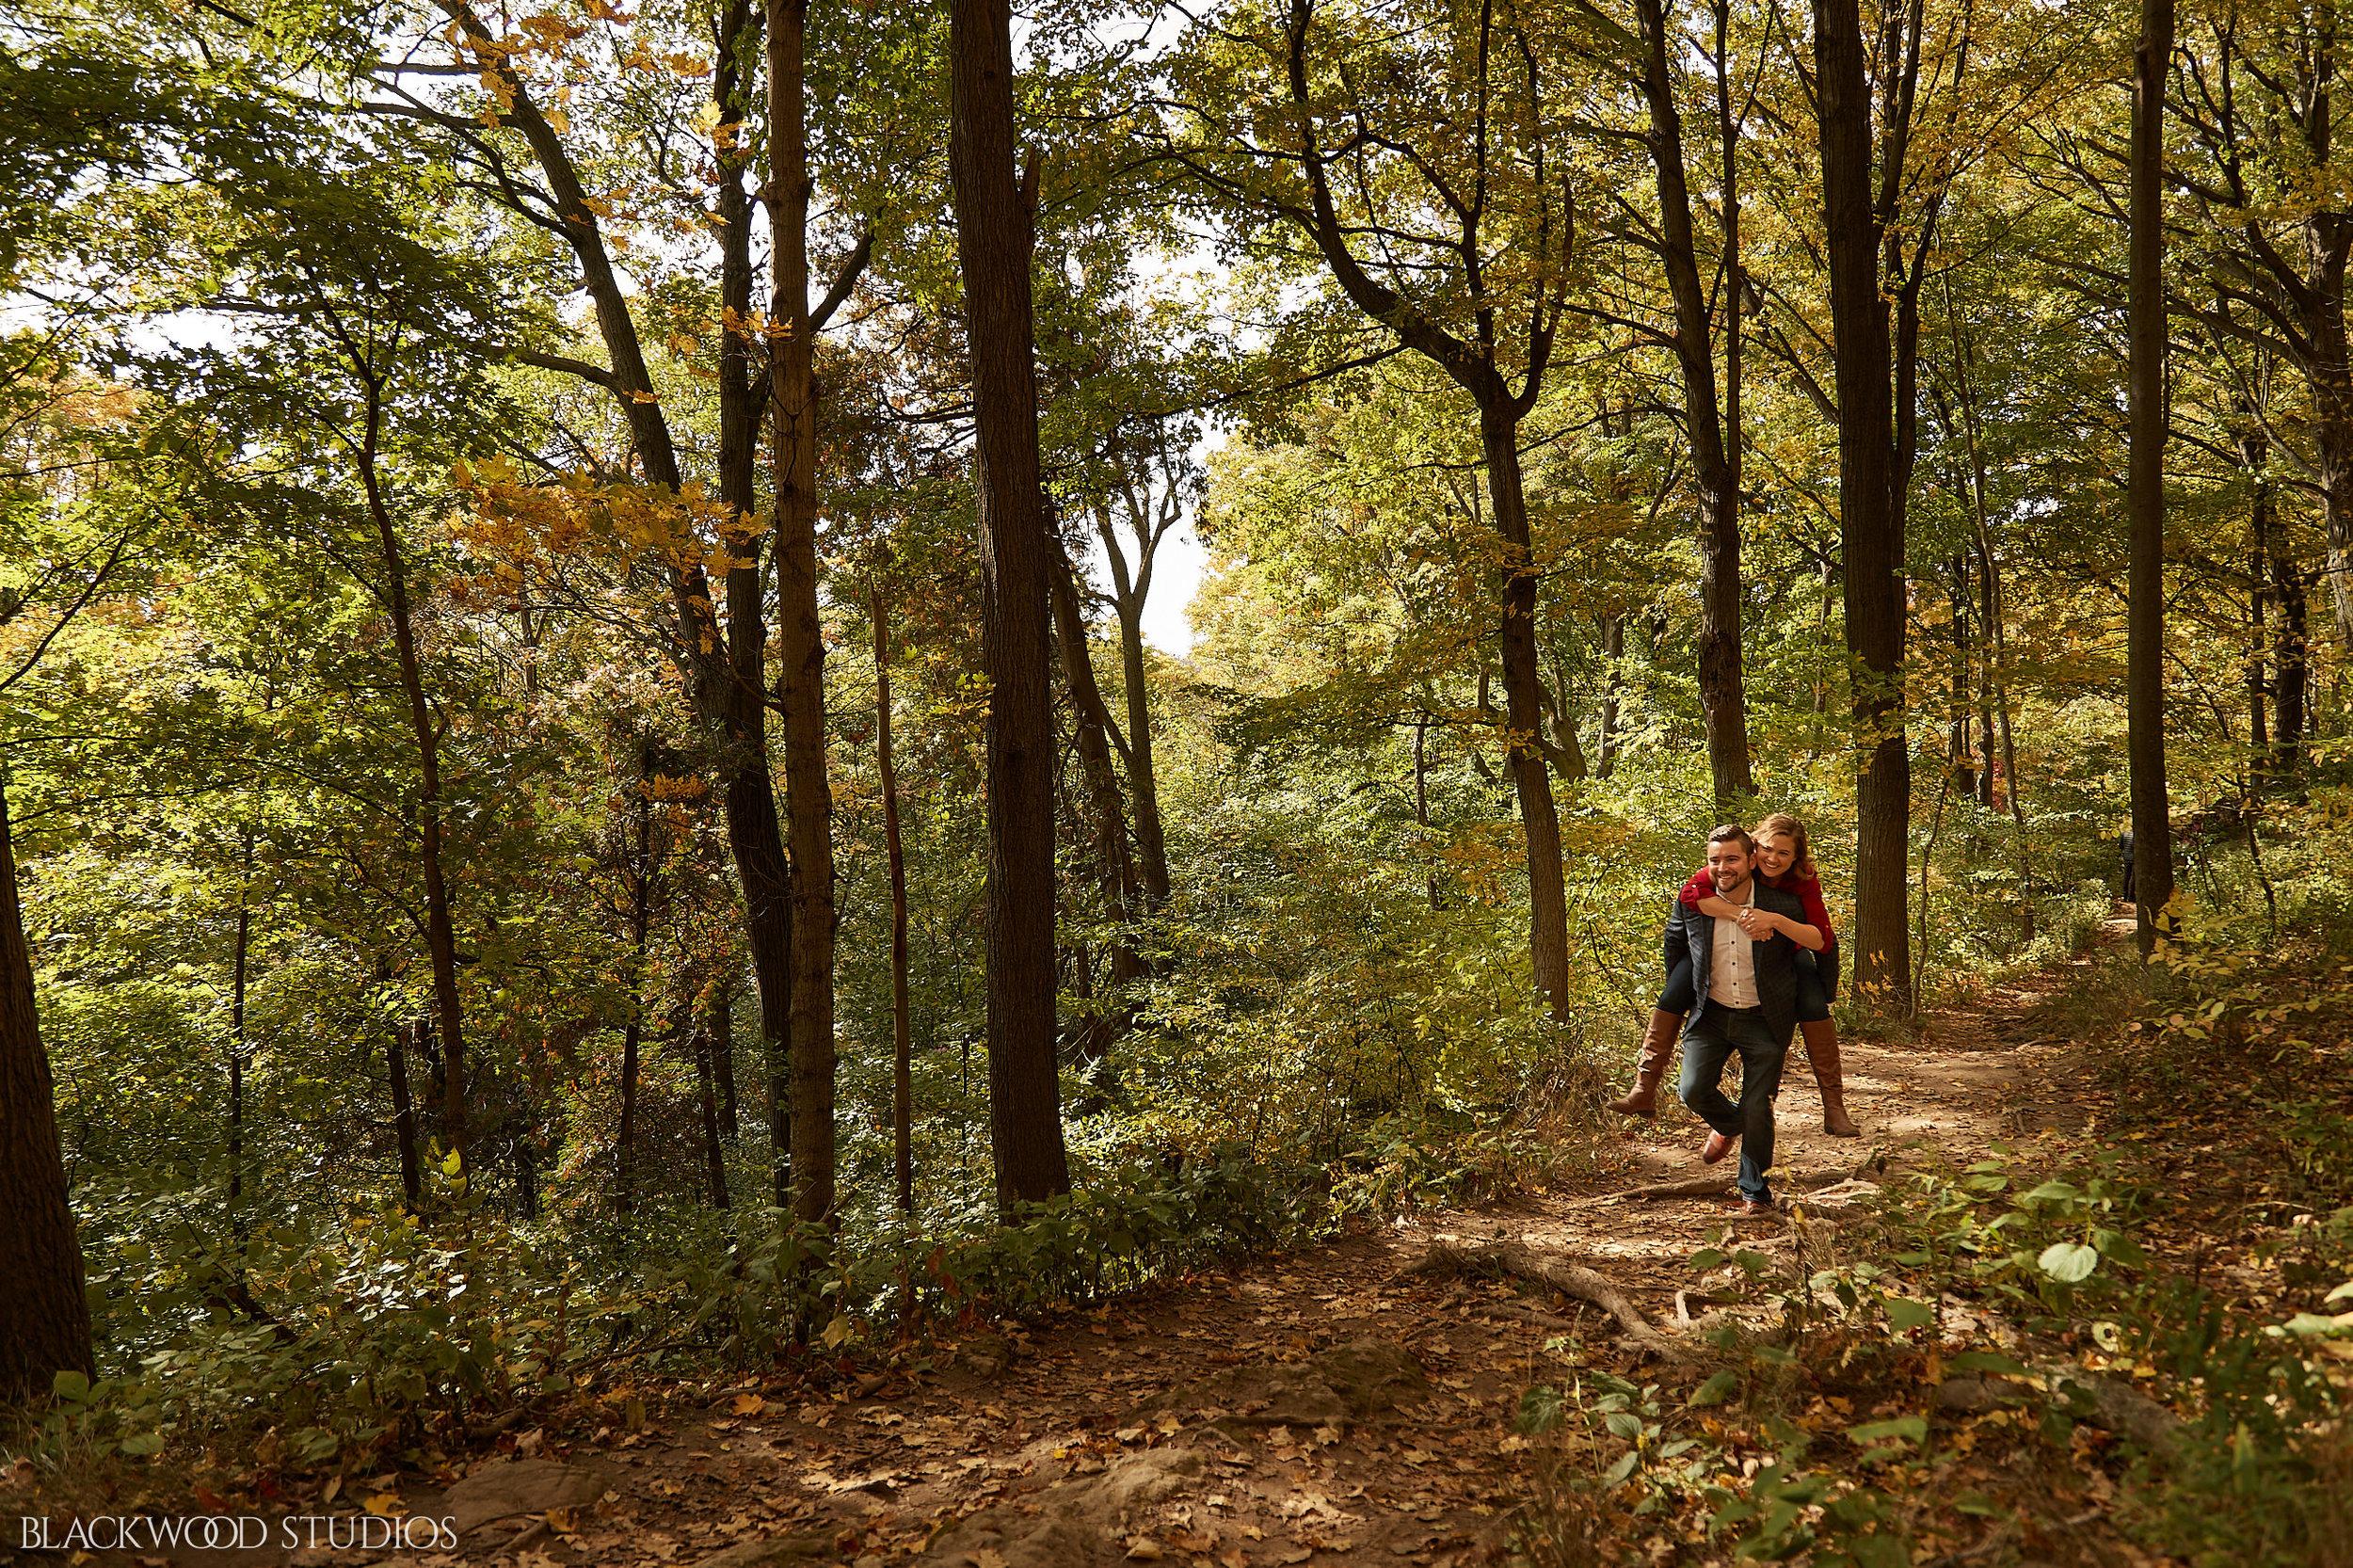 Blackwood-Studios-20181014-150623-Dave-and-Natalie-Engagement-0095-Rattlesnake-Point-Conservation-Area-Milton-Ontario.jpg